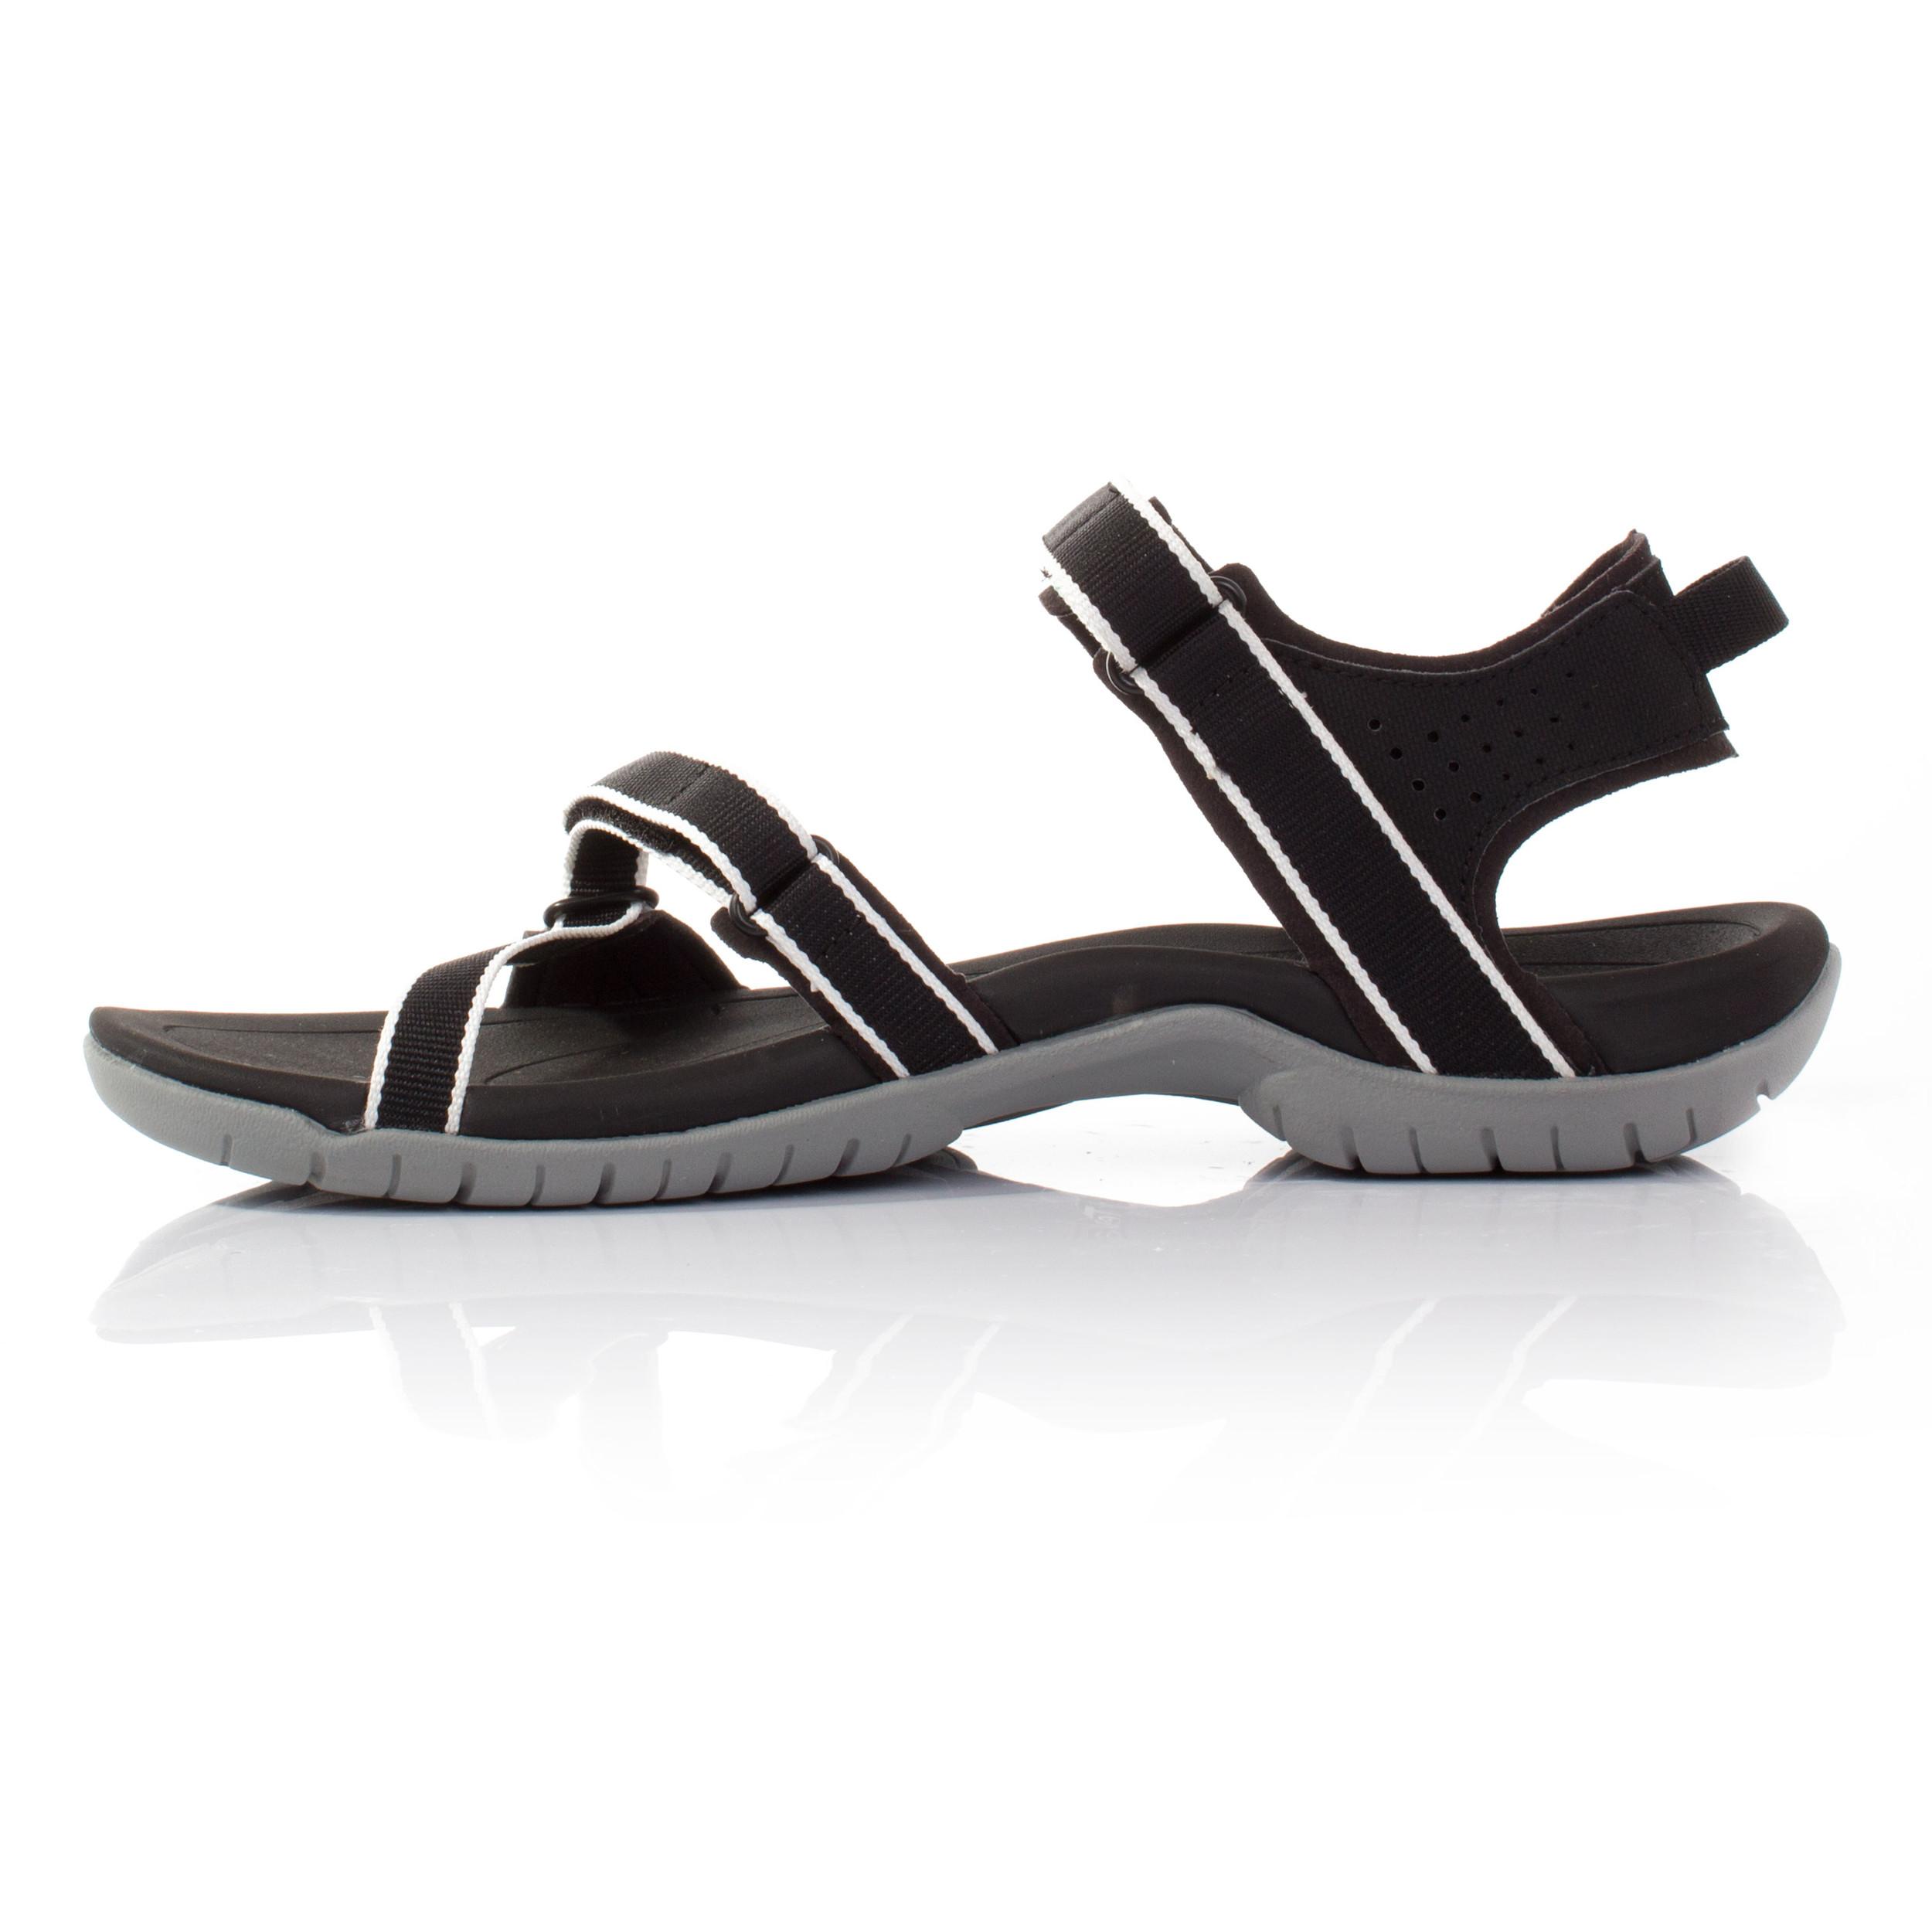 teva verra damen trekkingsandalen wanderschuhe outdoor sandalen mehrfarbig ebay. Black Bedroom Furniture Sets. Home Design Ideas